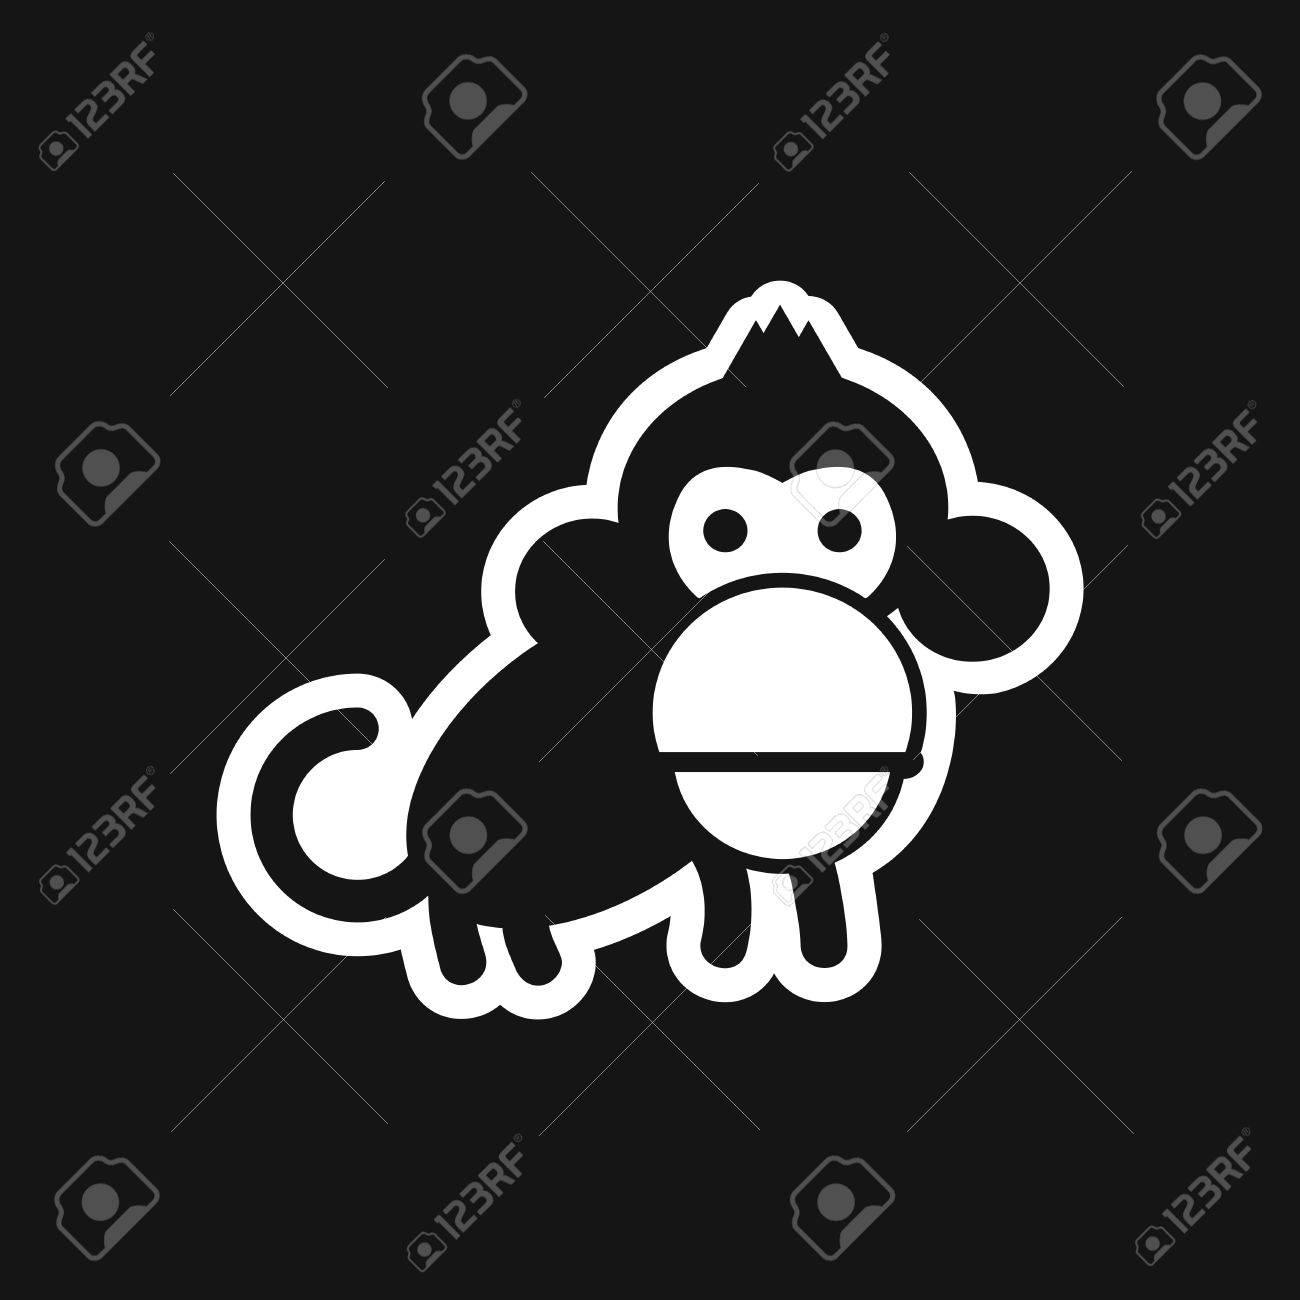 stylish black and white icon small chimpanzee - 65943353